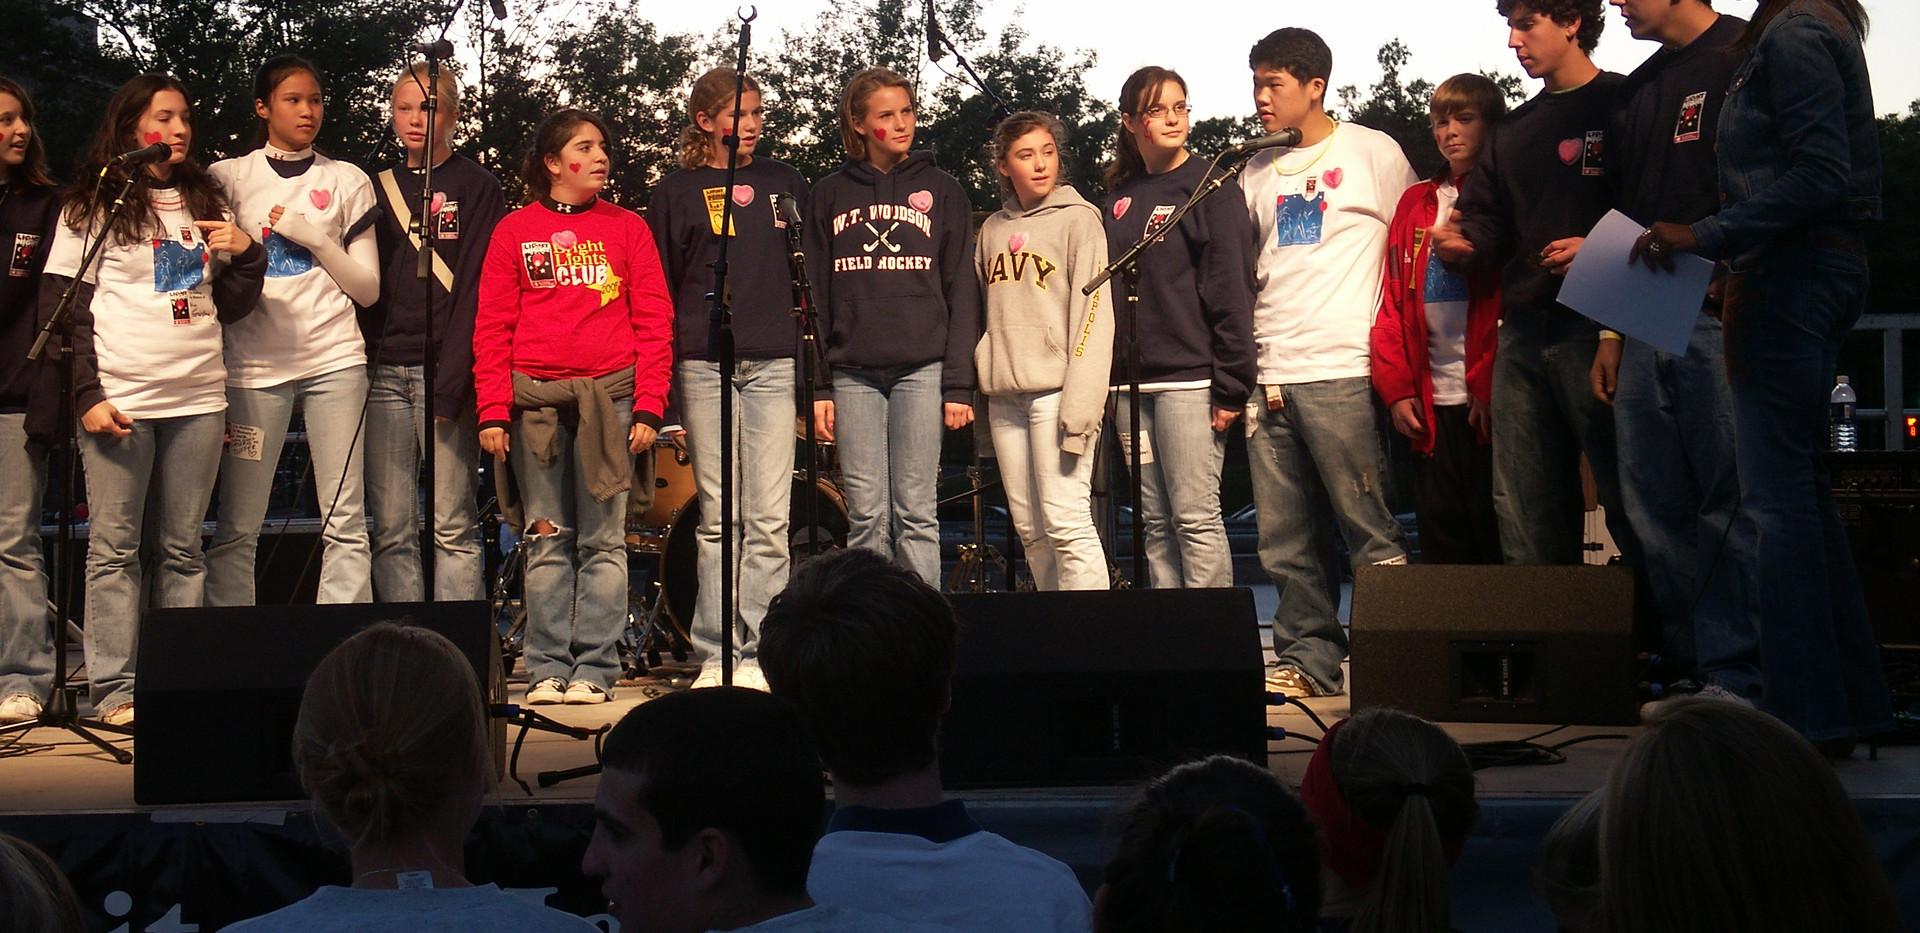 ltn 2006.JPG